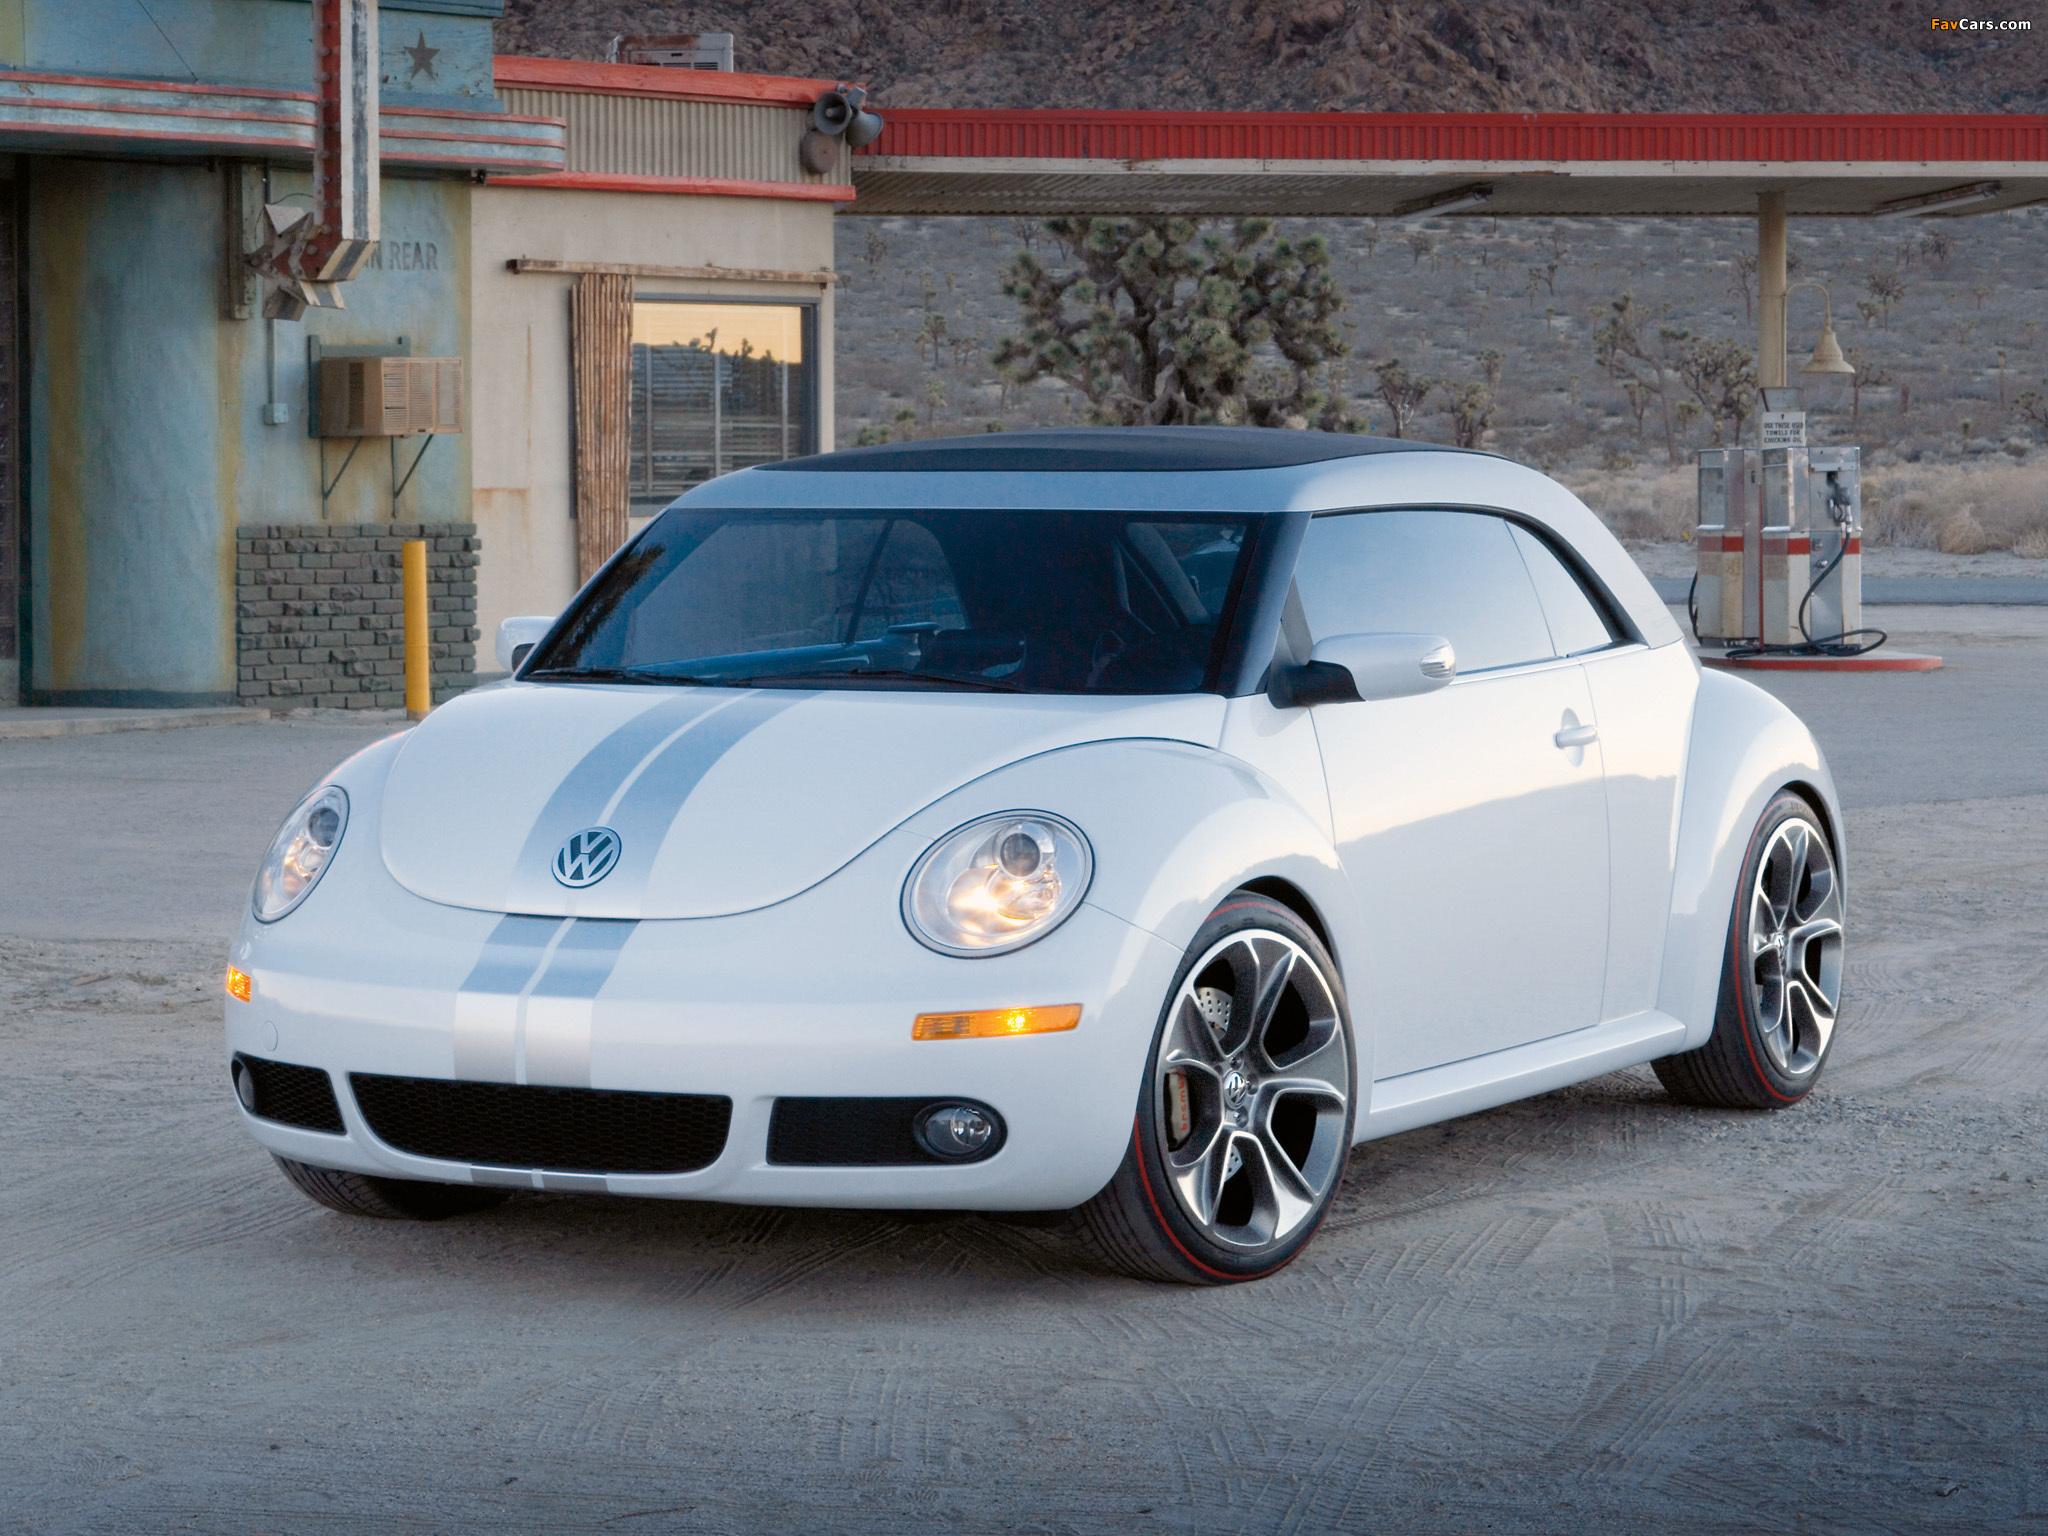 Volkswagen New Beetle Ragster Concept 2005 pictures (2048 x 1536)